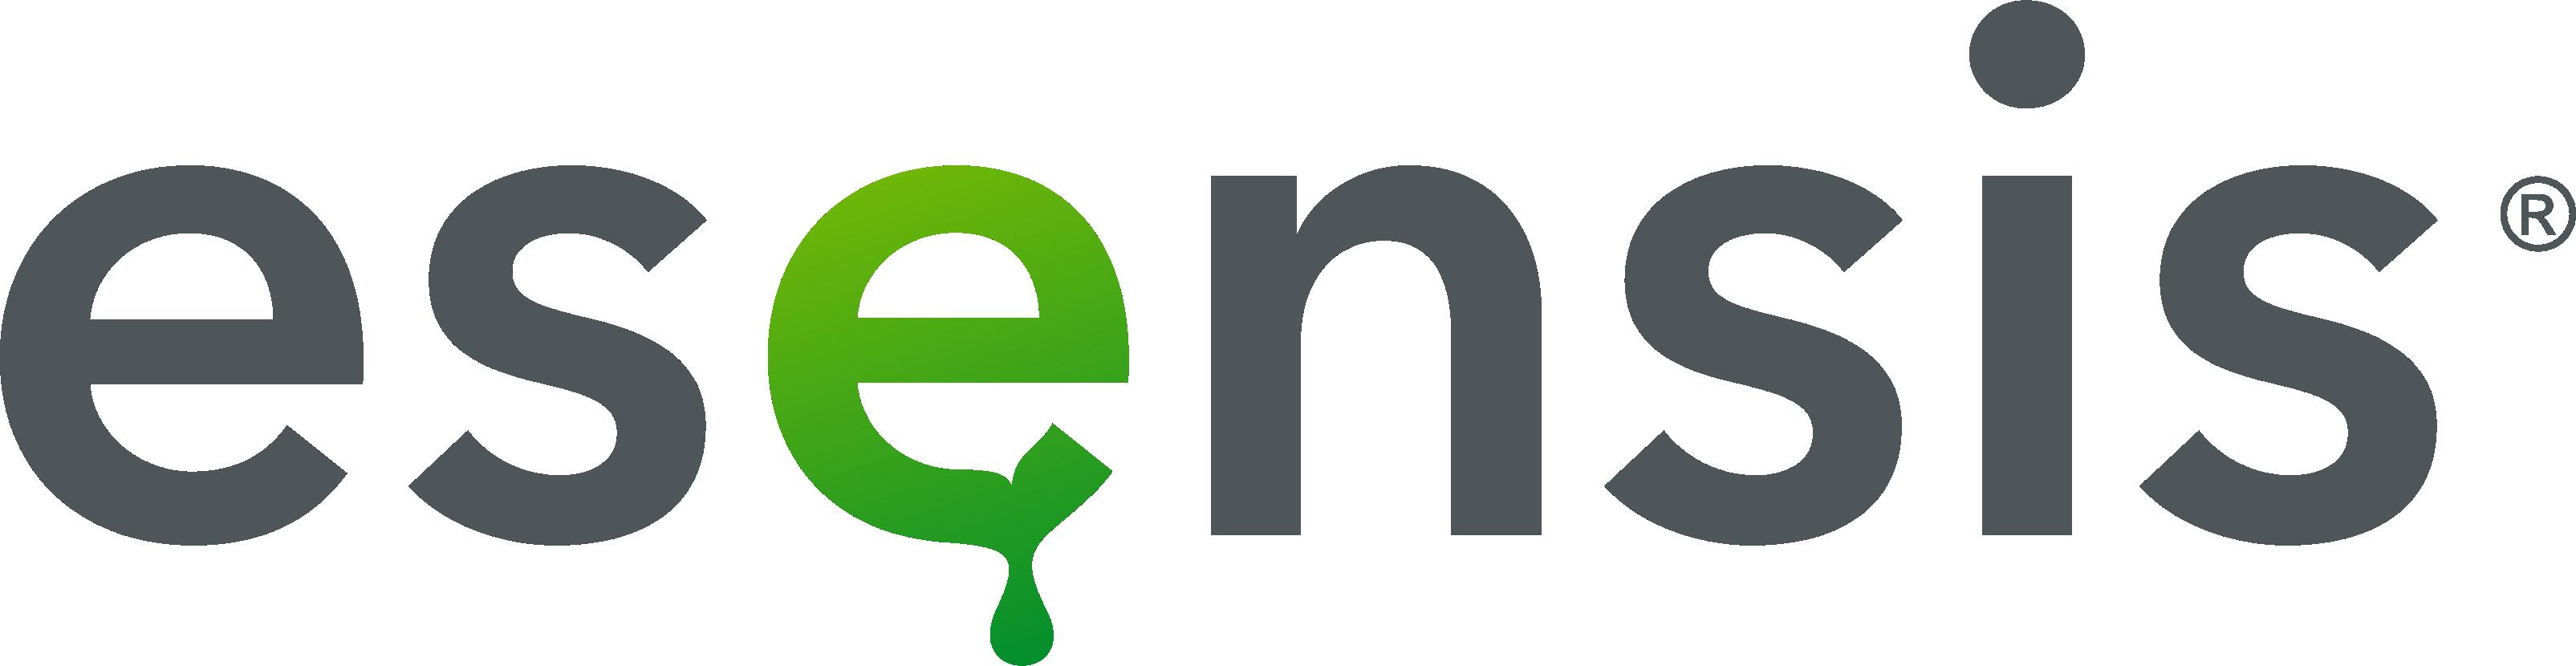 Esensis